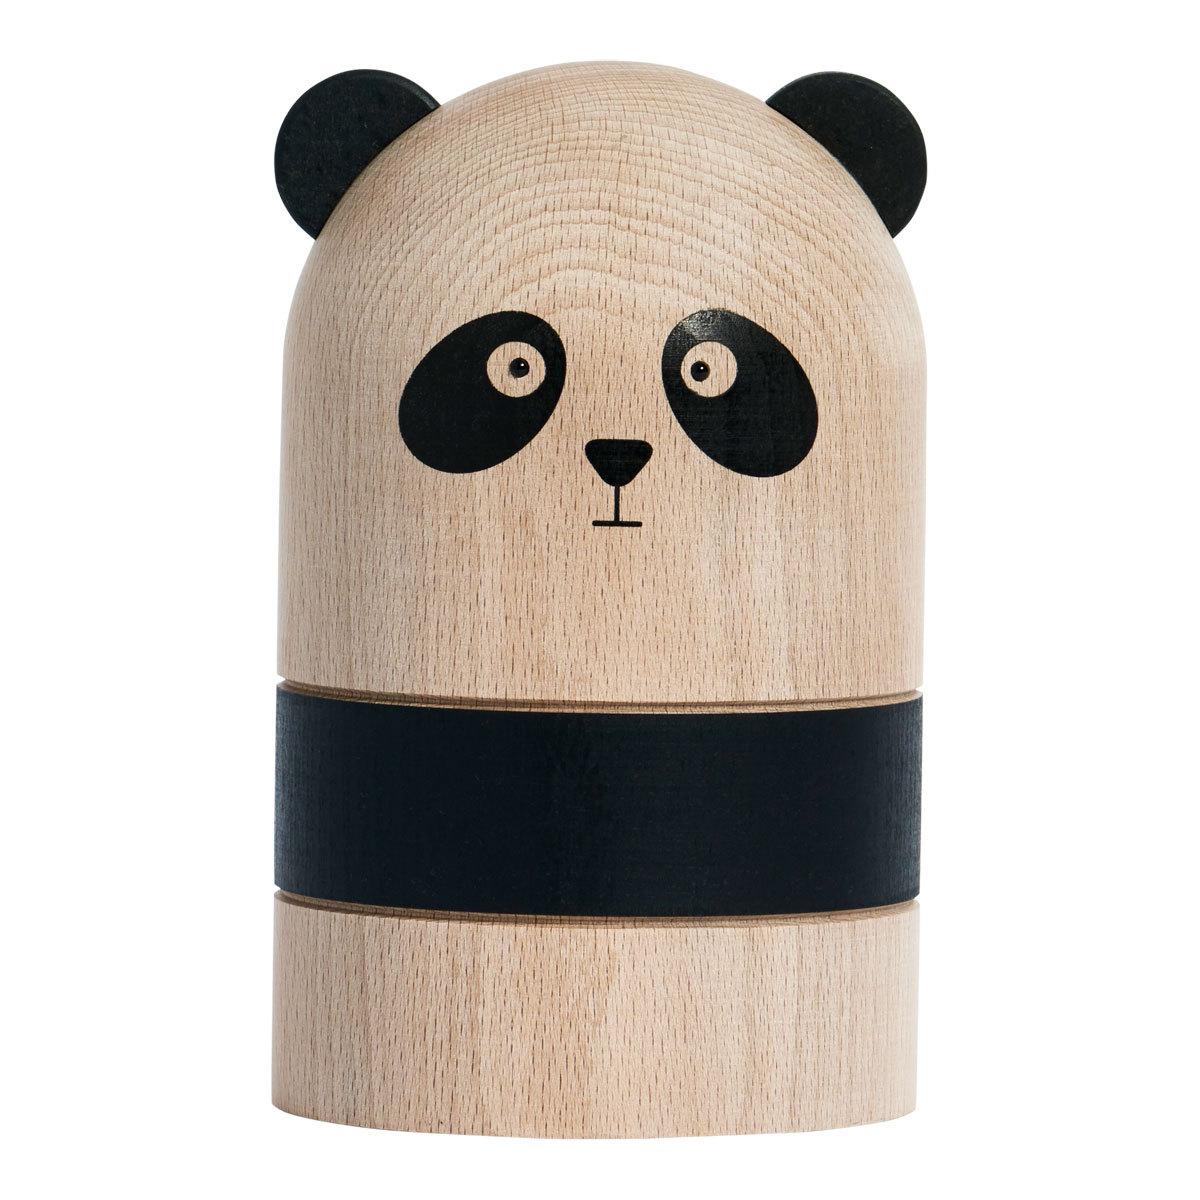 Tirelire Tirelire Panda Tirelire Panda